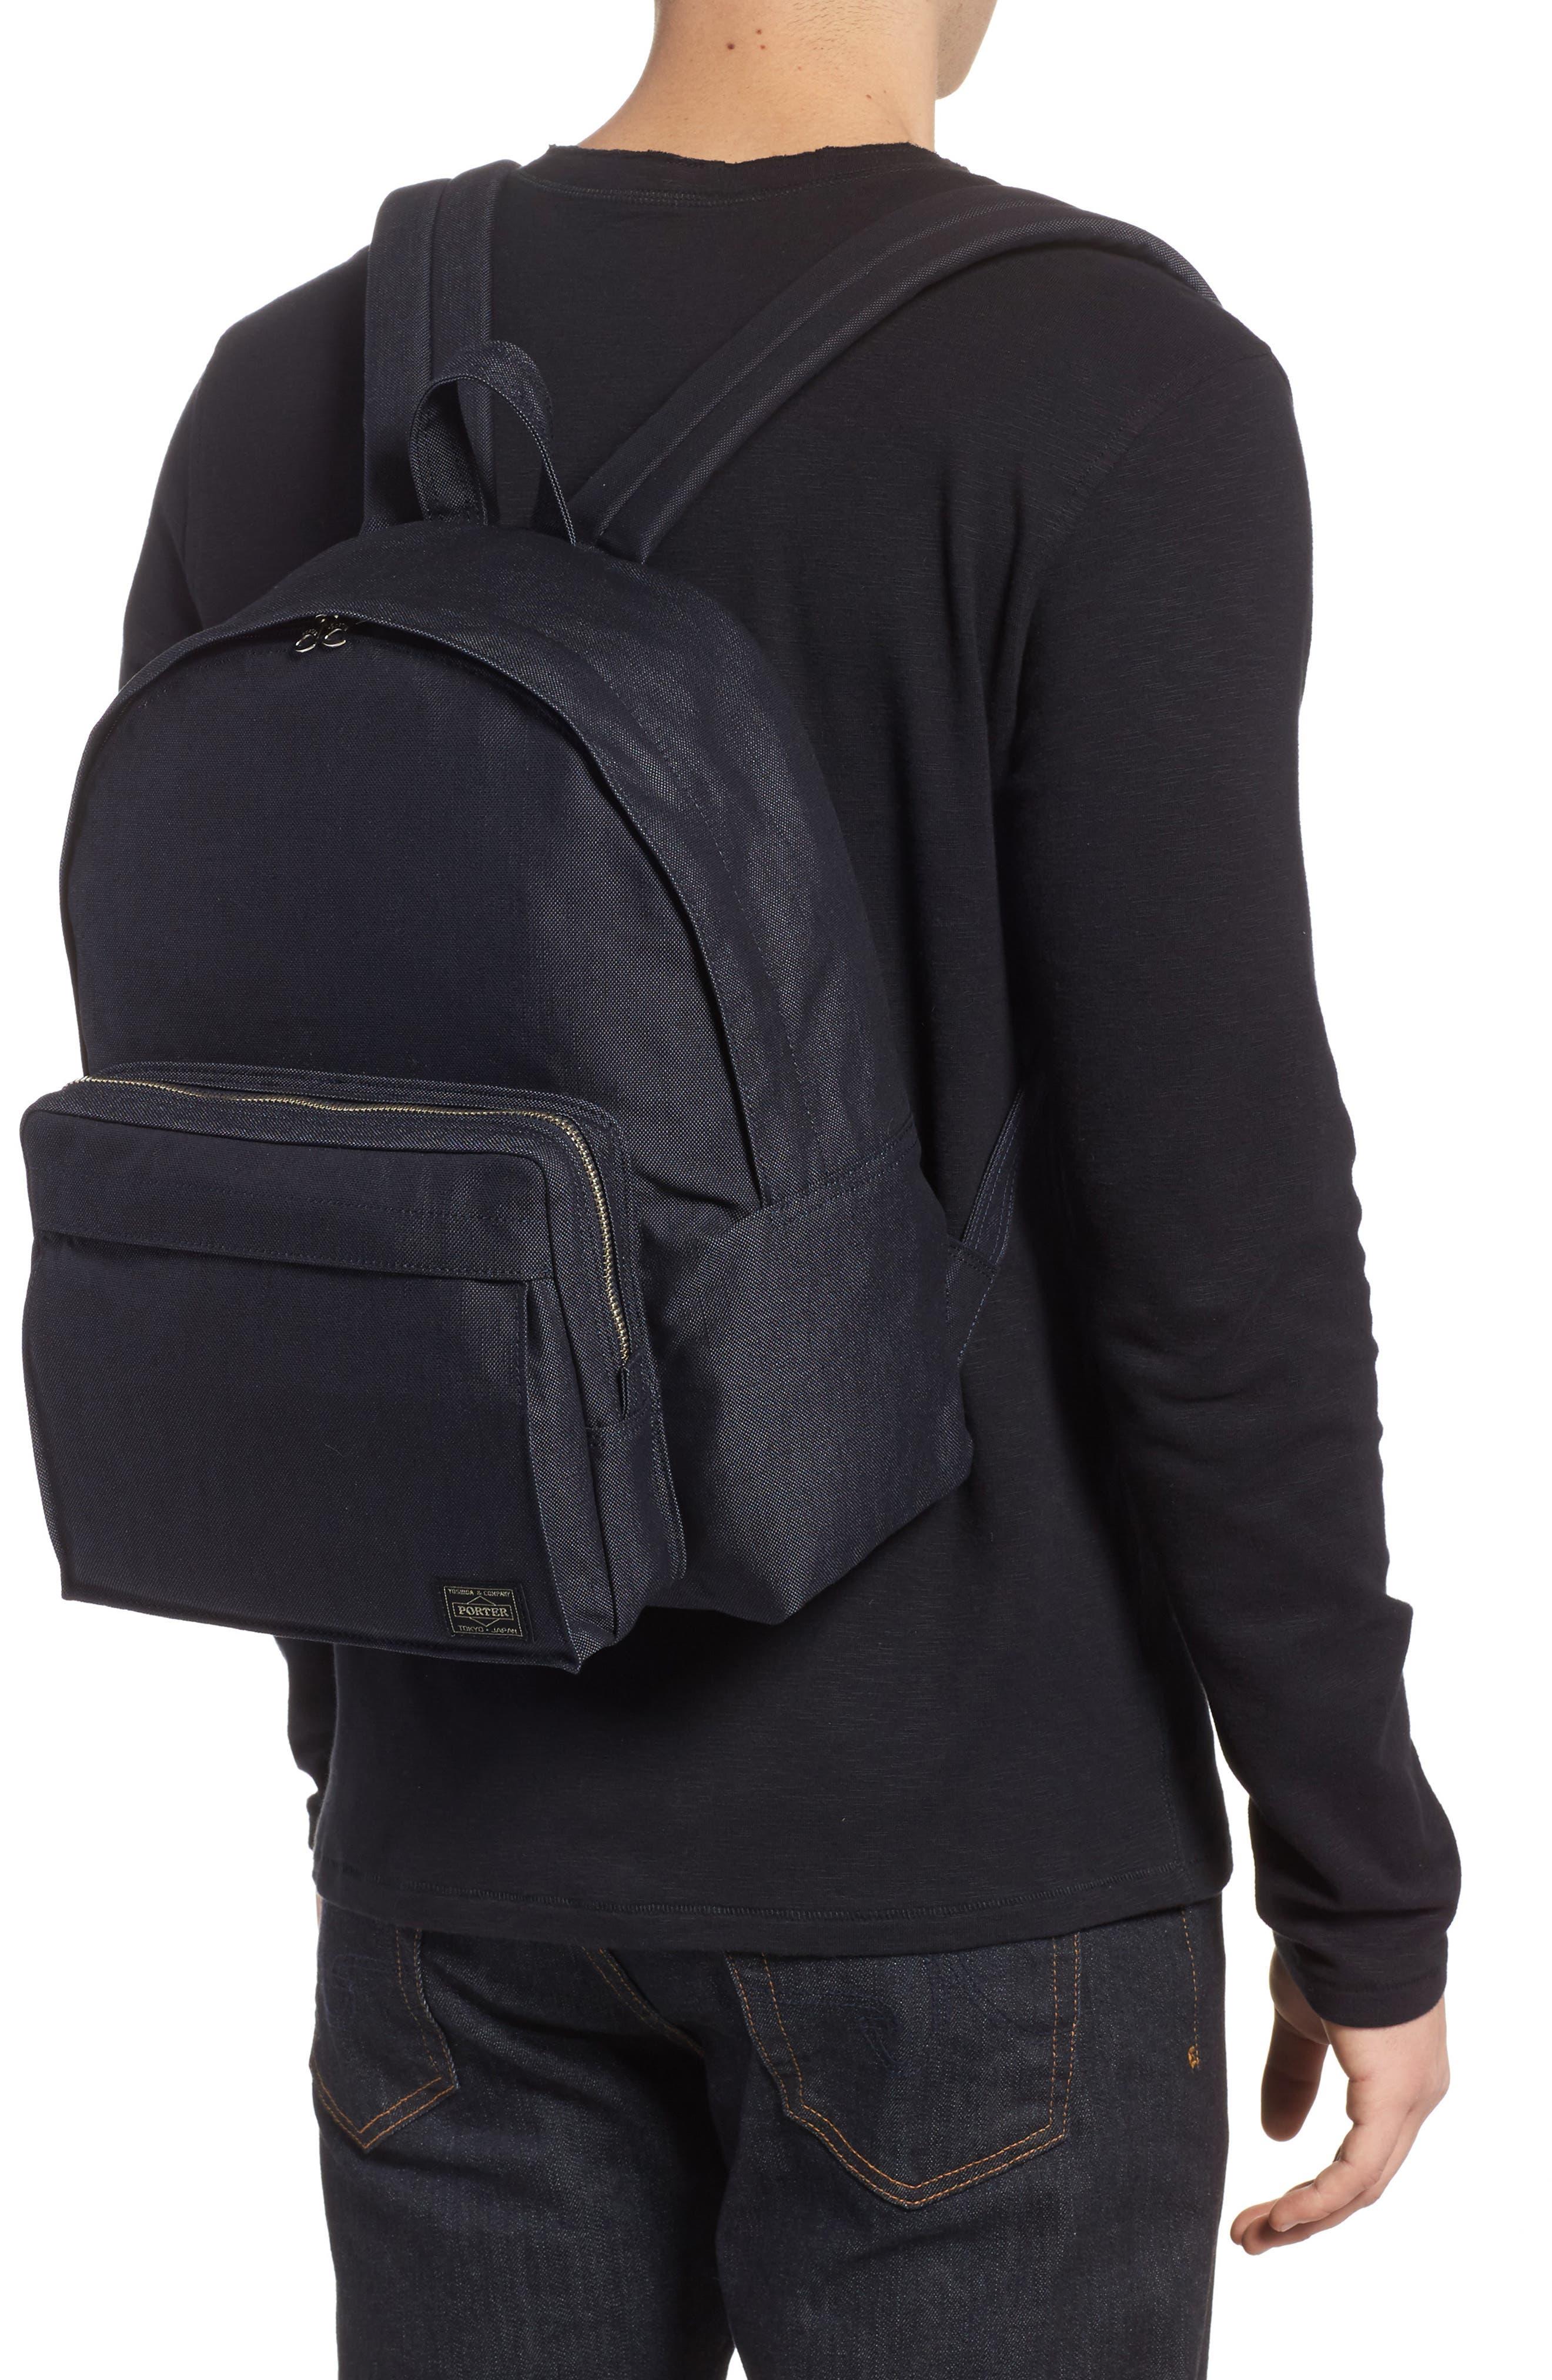 Porter-Yoshida & Co. Smoky Backpack,                             Alternate thumbnail 2, color,                             400